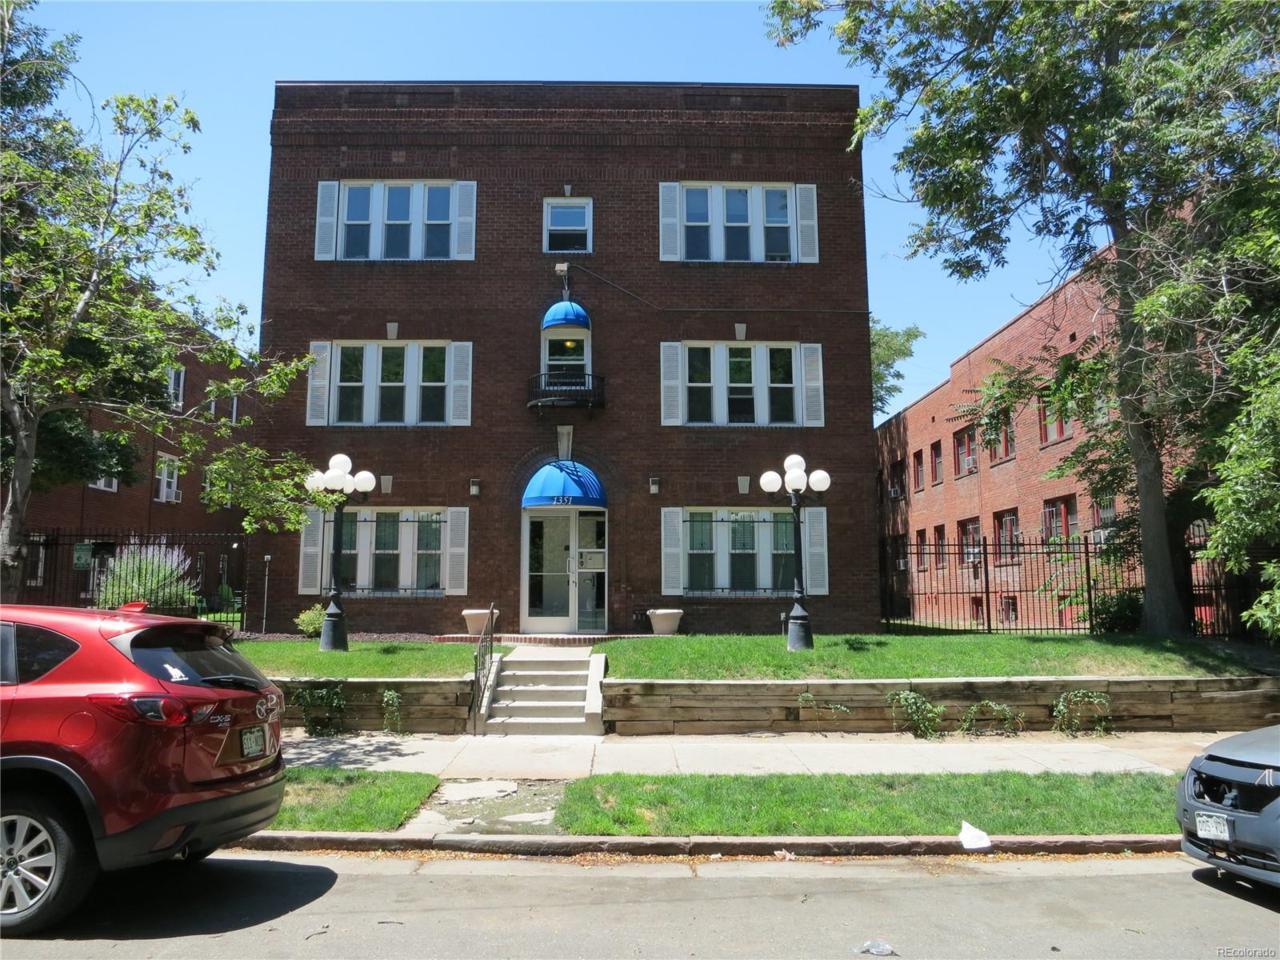 1351 Washington Street #23, Denver, CO 80203 (MLS #8469903) :: 8z Real Estate